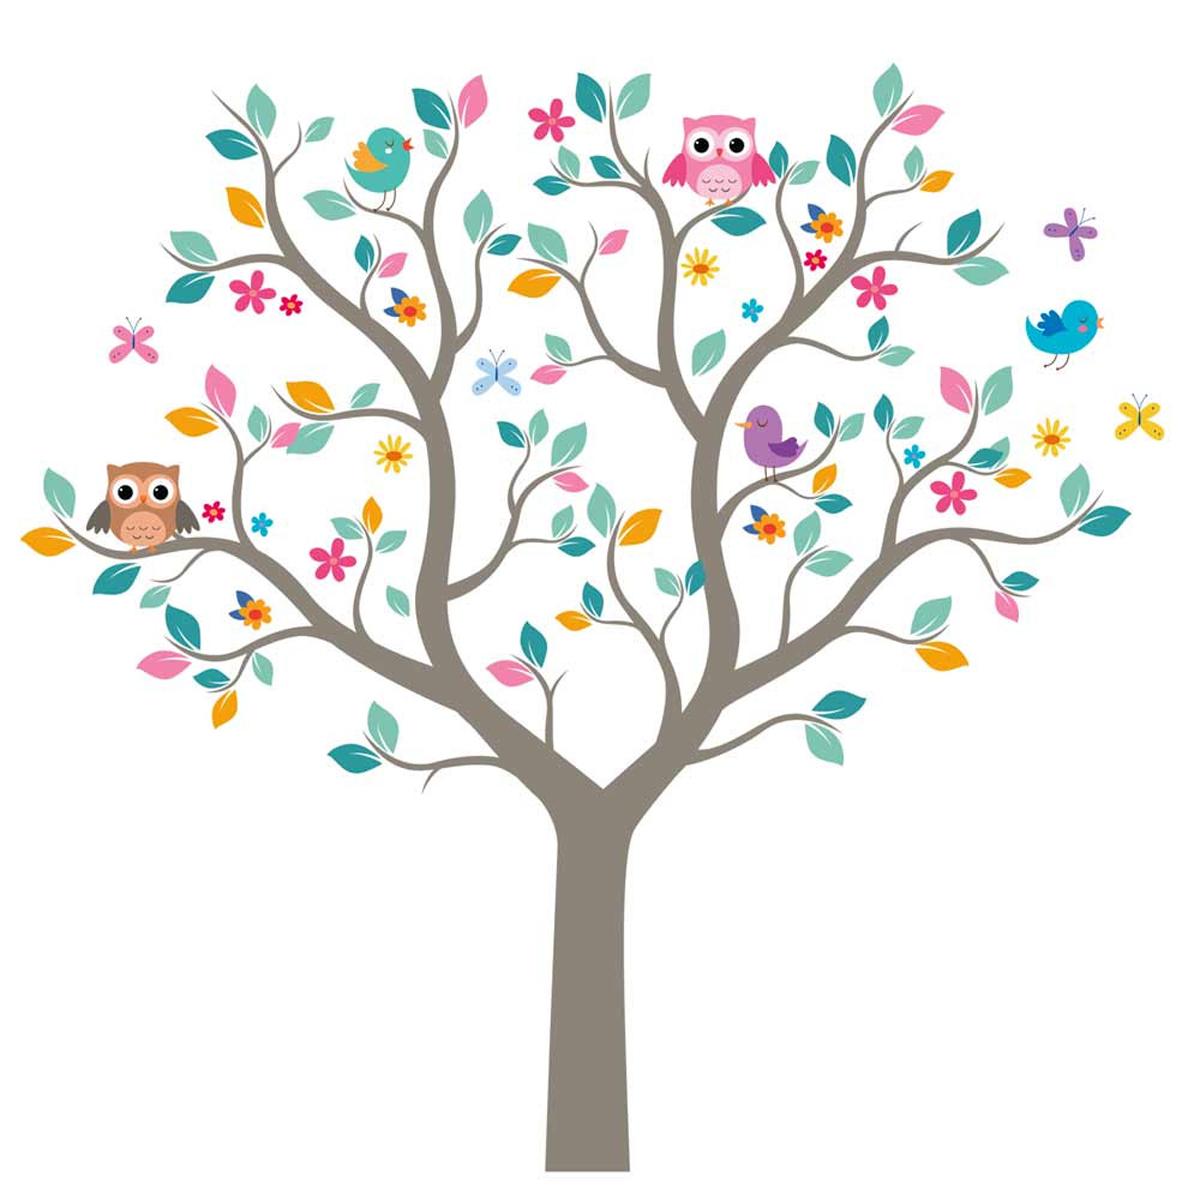 Planche de stickers \'Arbre de Vie Chouettes\' multicolore - 50x70 cm - [R1829]